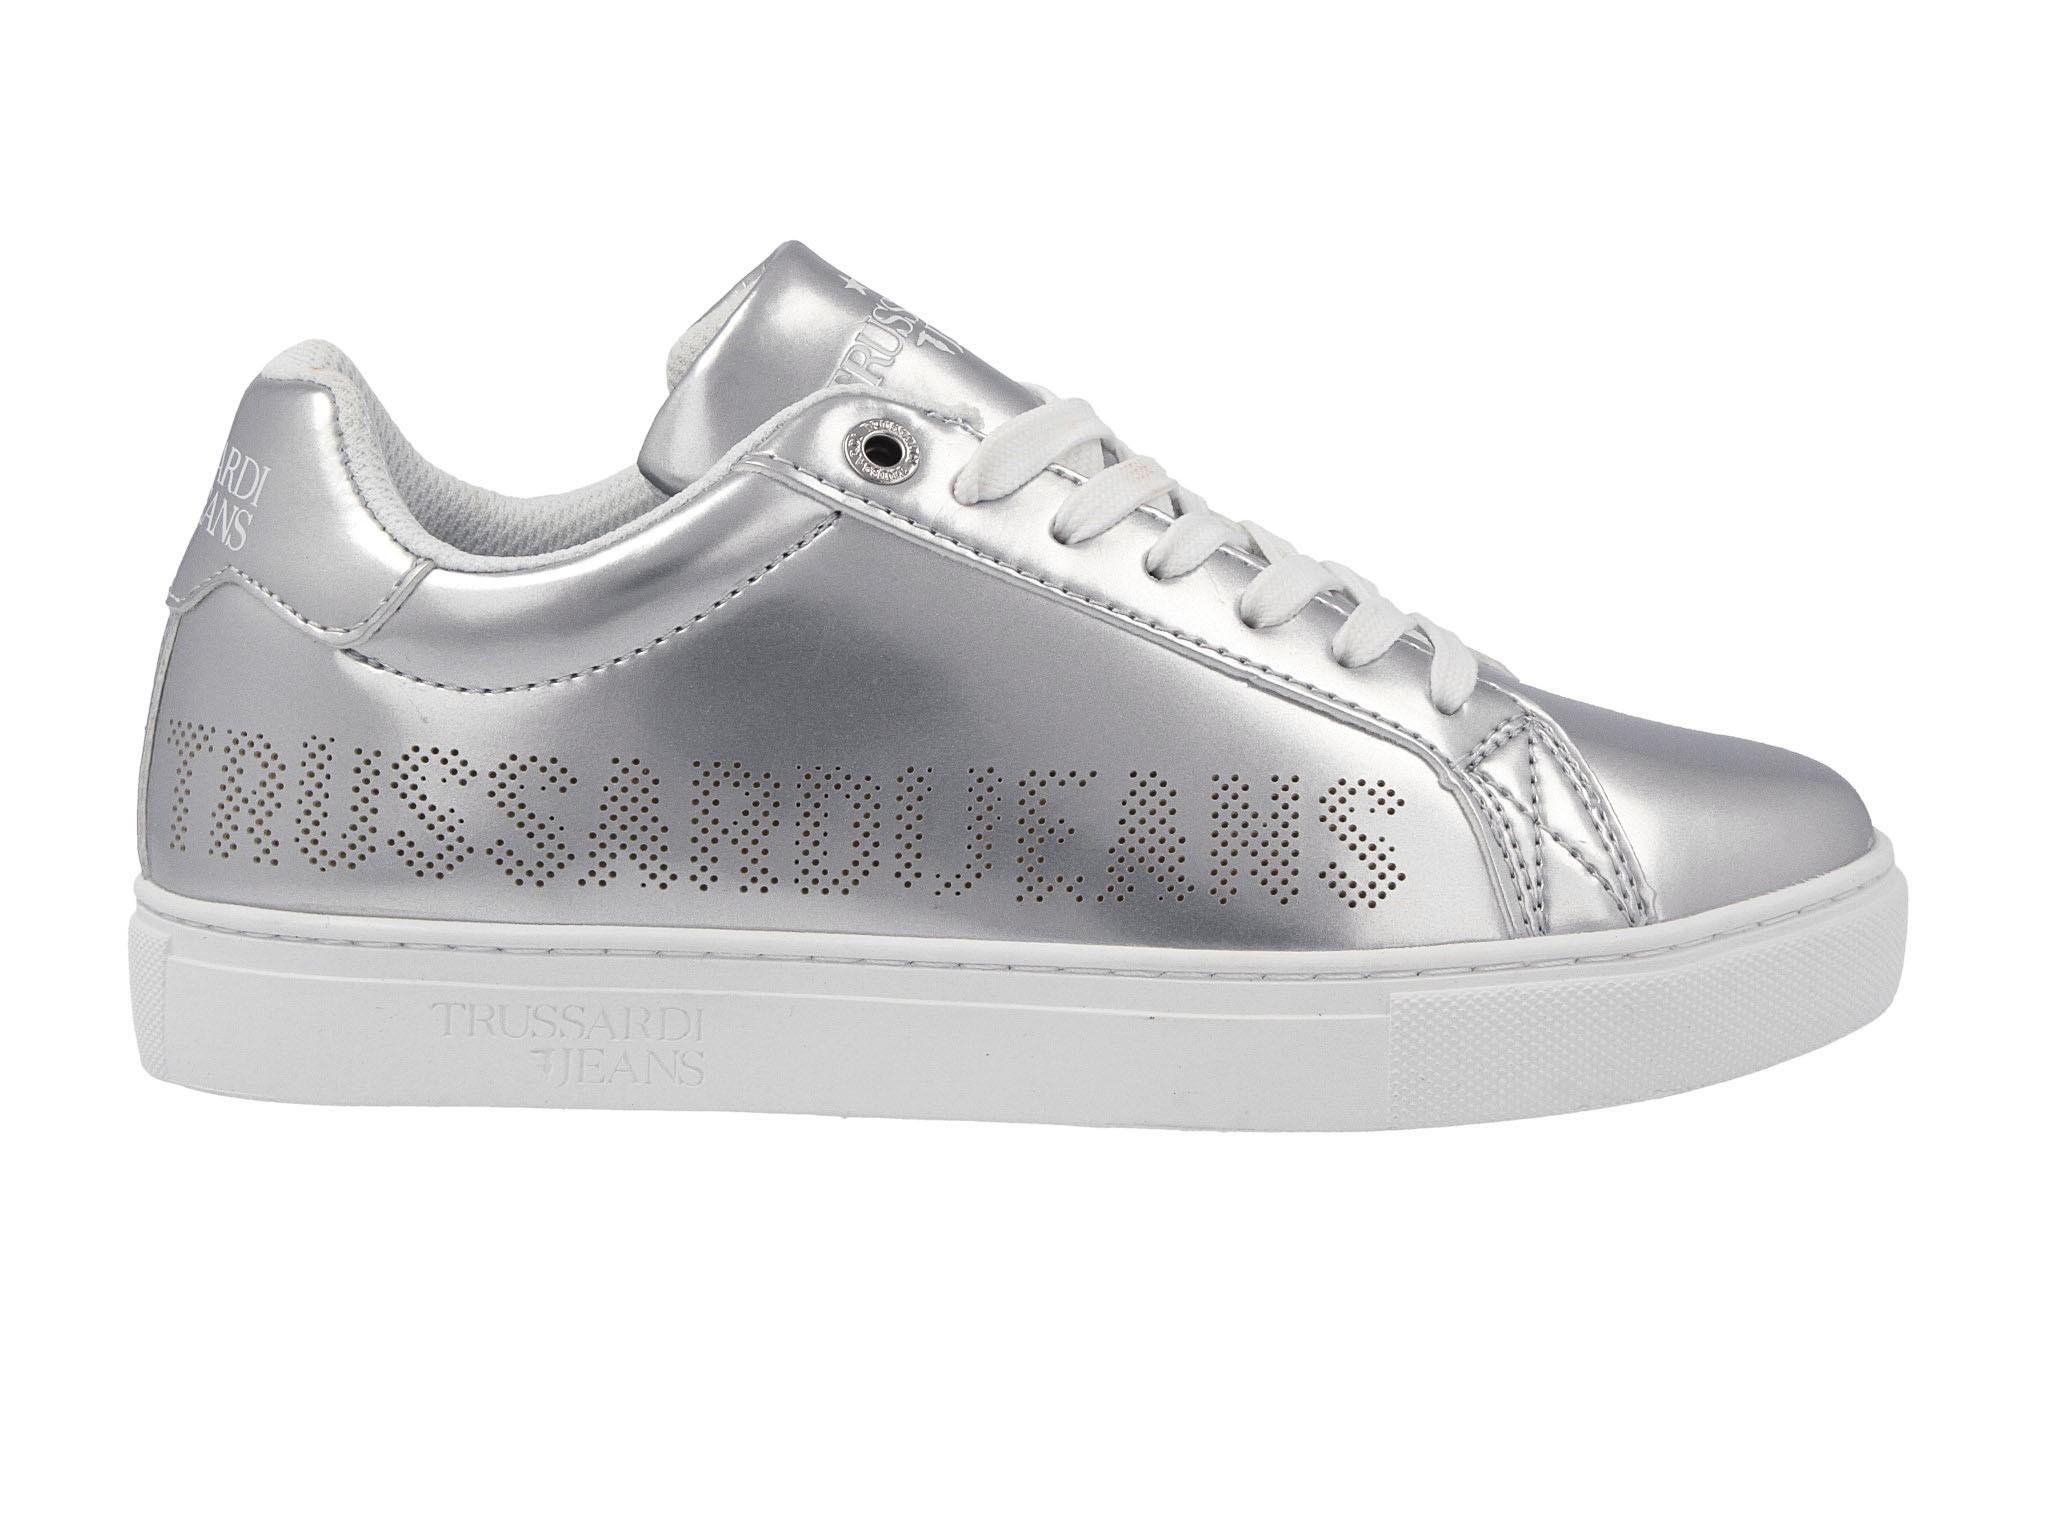 Sportcipő TRUSSARDI JEANS - 79A00465 M020 - Sneakers - Félcipő - Női